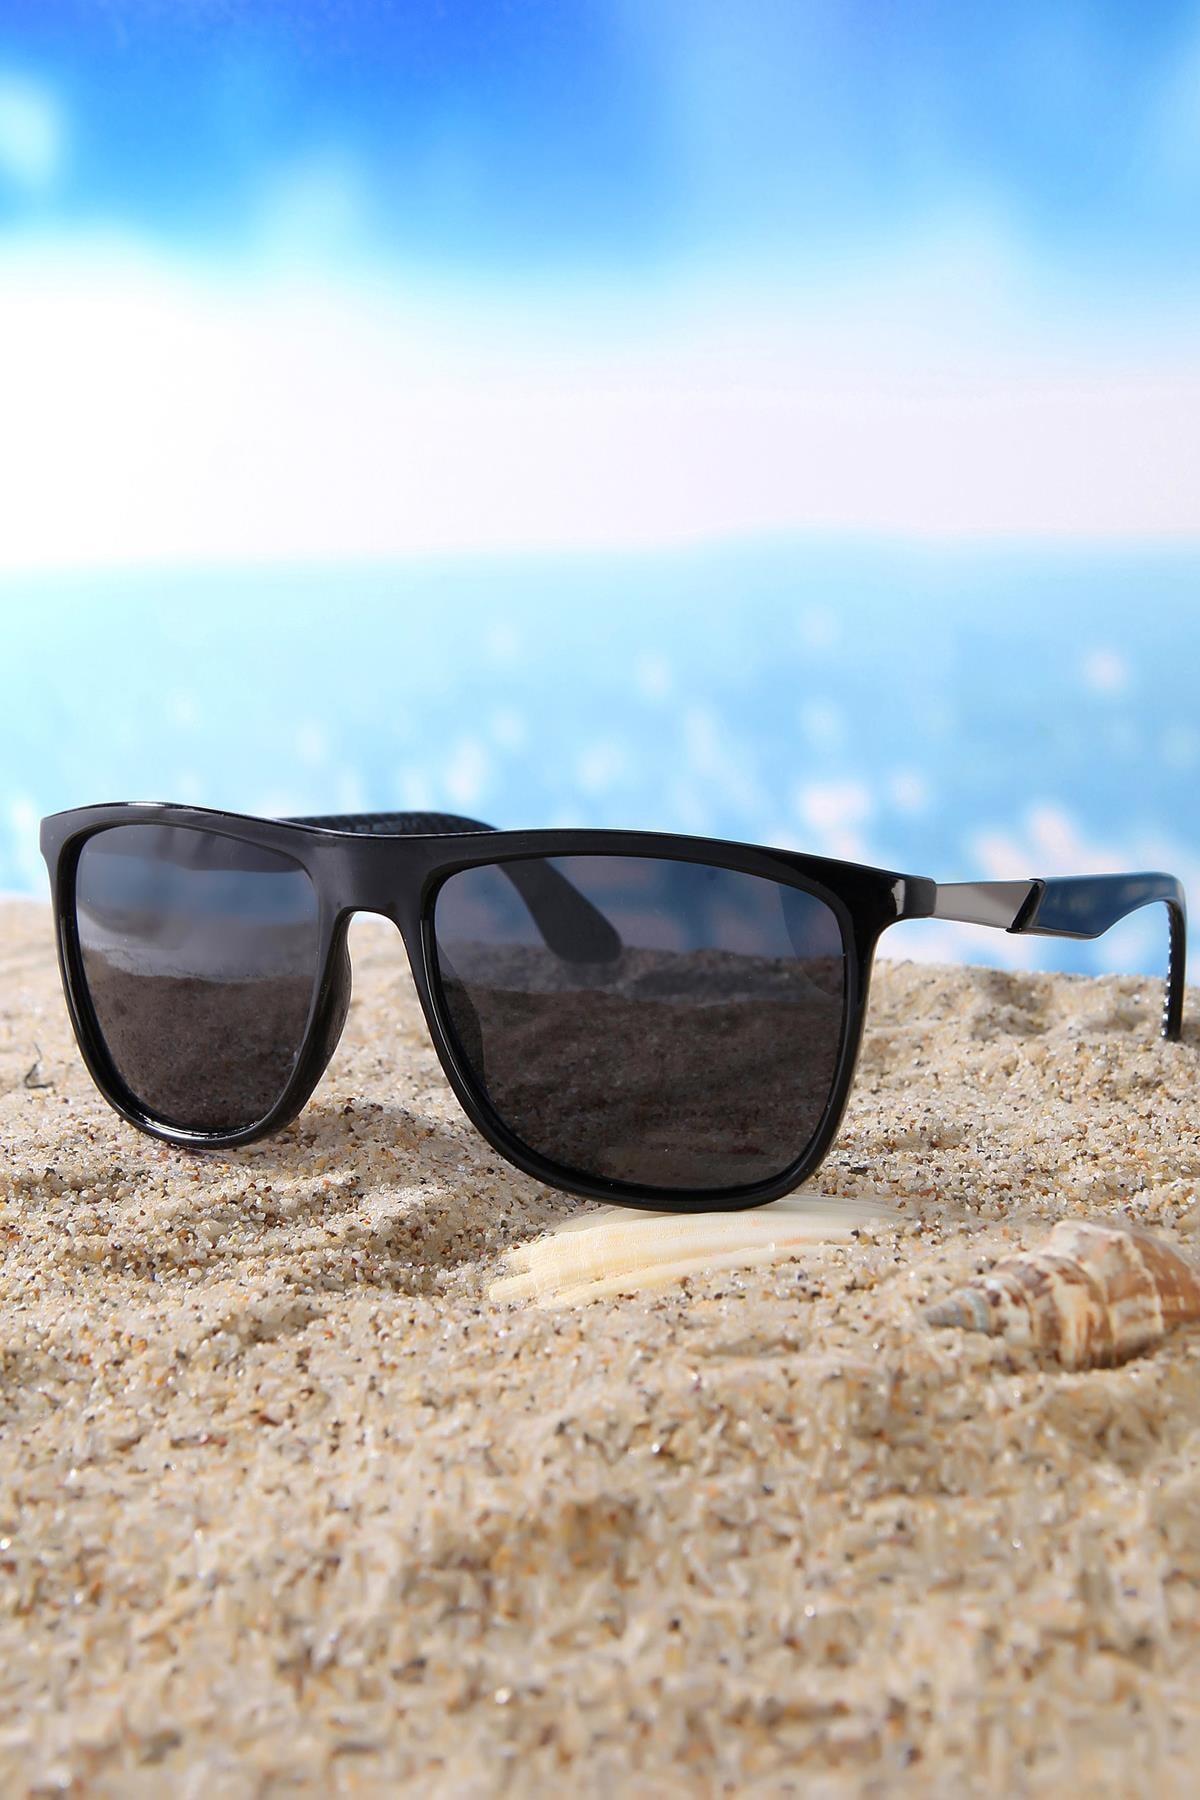 Di Caprio Erkek Dikdörtgen Di Caprio Polarize Güneş Gözlüğü DTX1084A 1